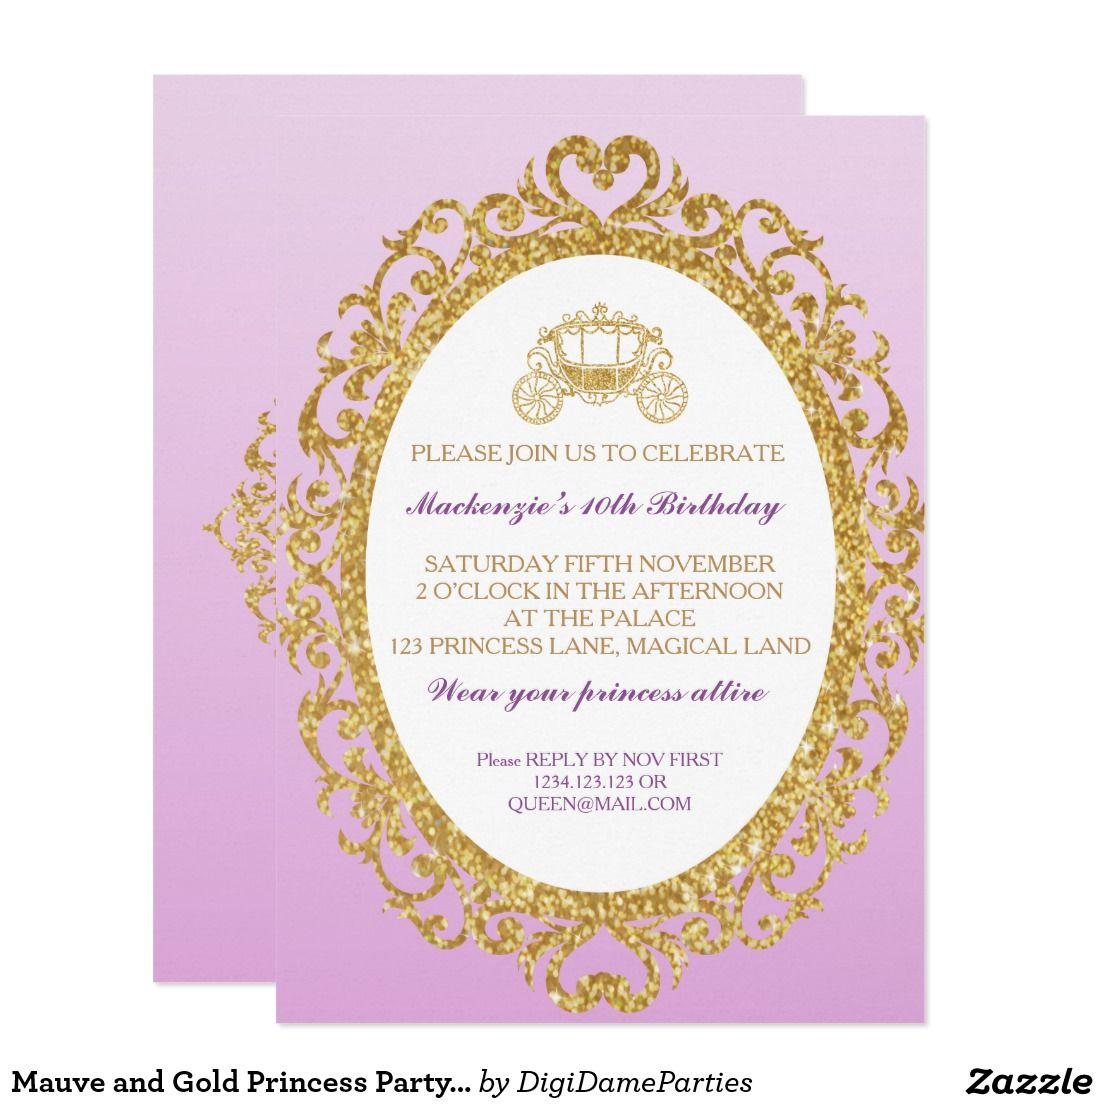 Mauve and Gold Princess Party Invitation   Princess party ...